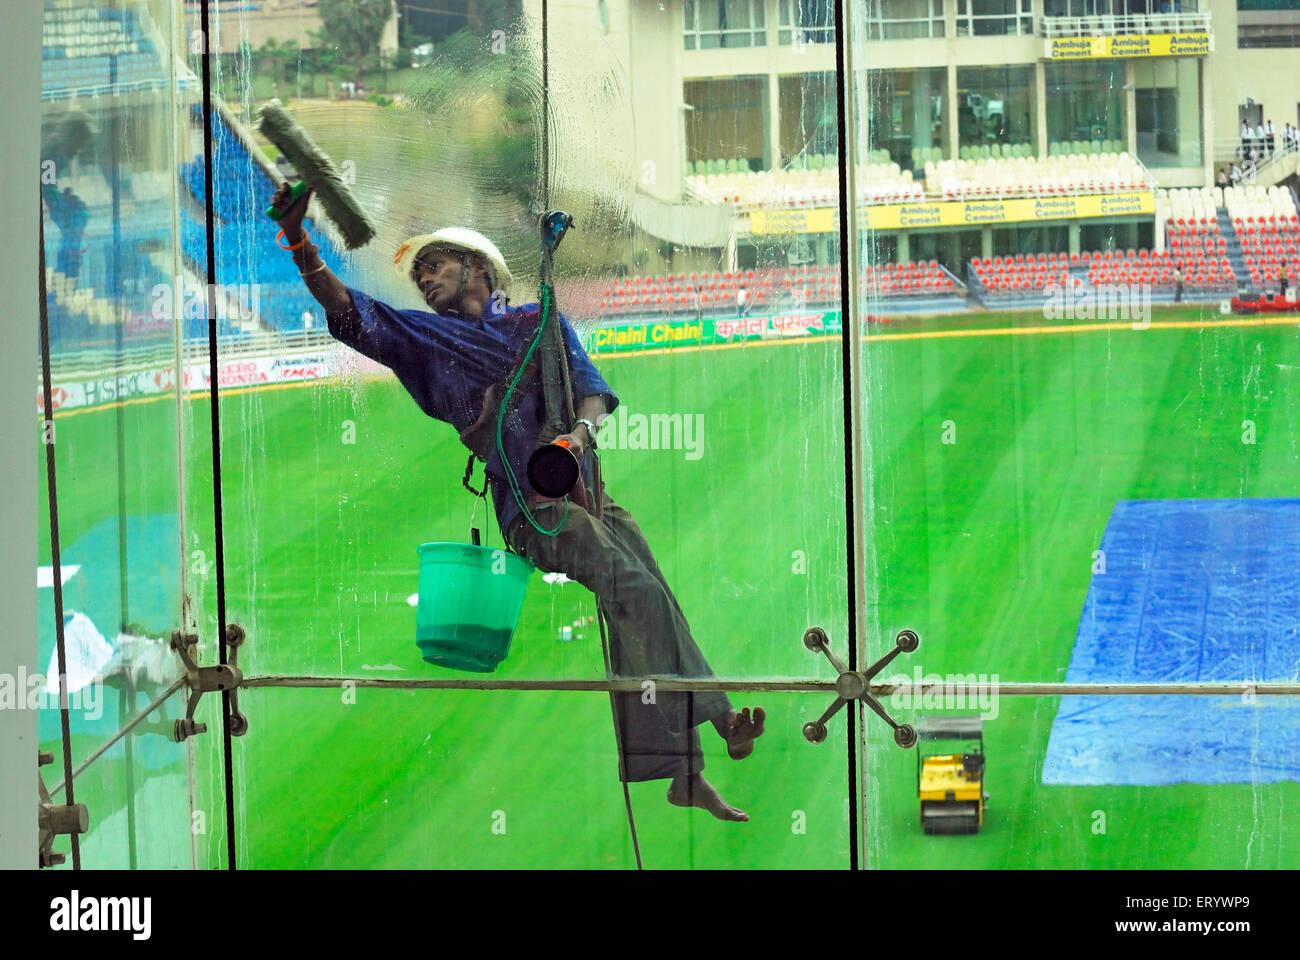 Glass cleaner at D Y Patil cricket stadium  ; Nerul  ; Navi Bombay Mumbai  ; Maharashtra  ; India NOMR - Stock Image